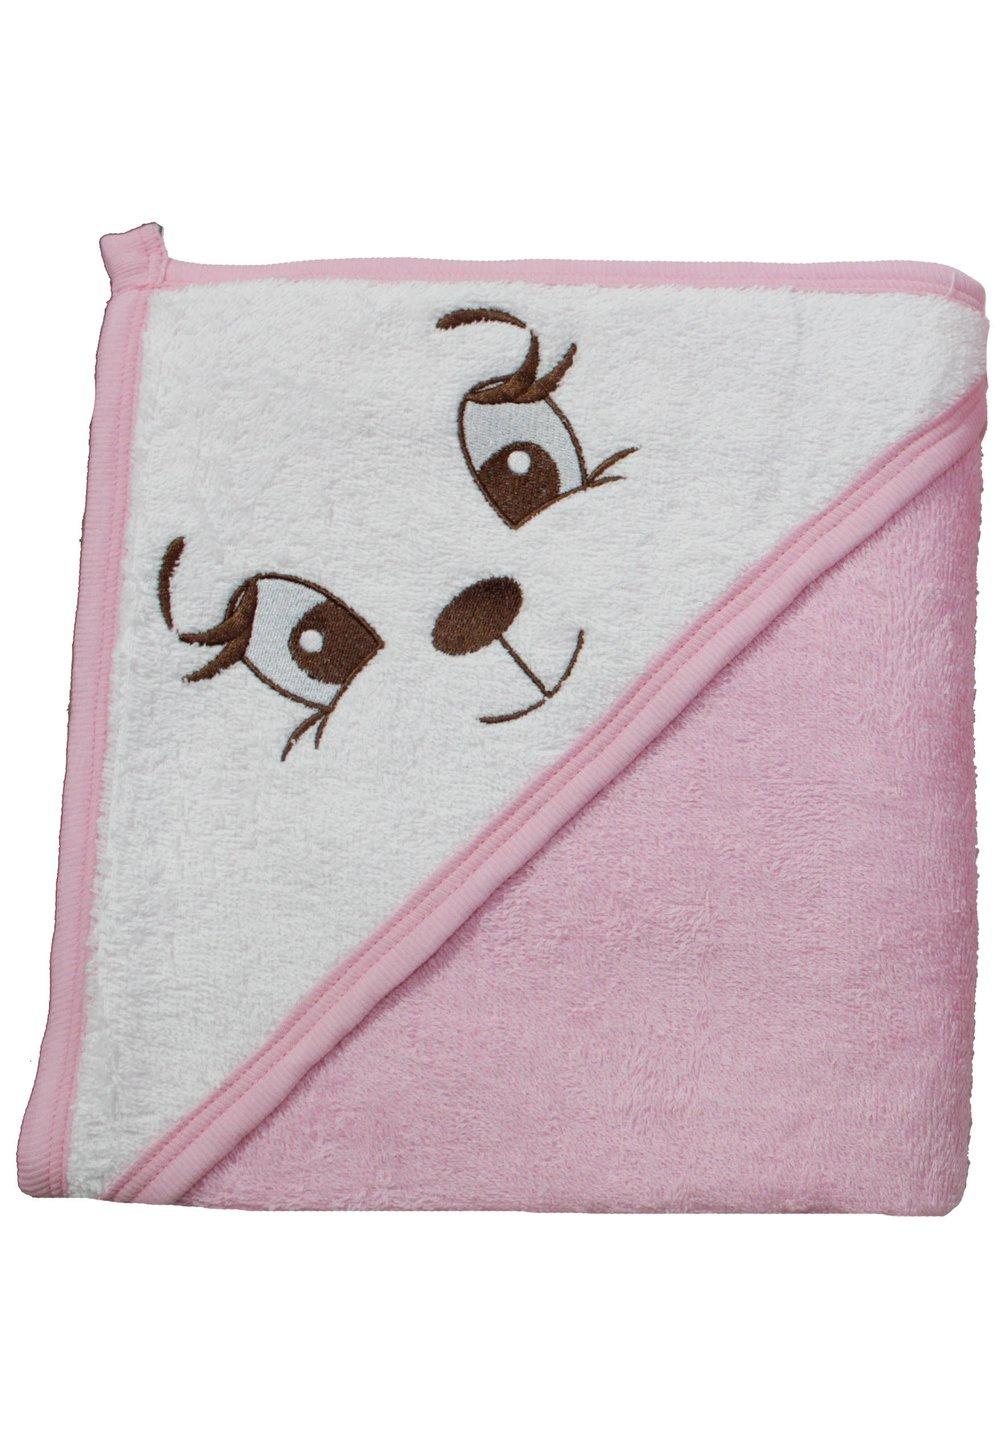 Prosop roz, catelusa, 80x100cm imagine